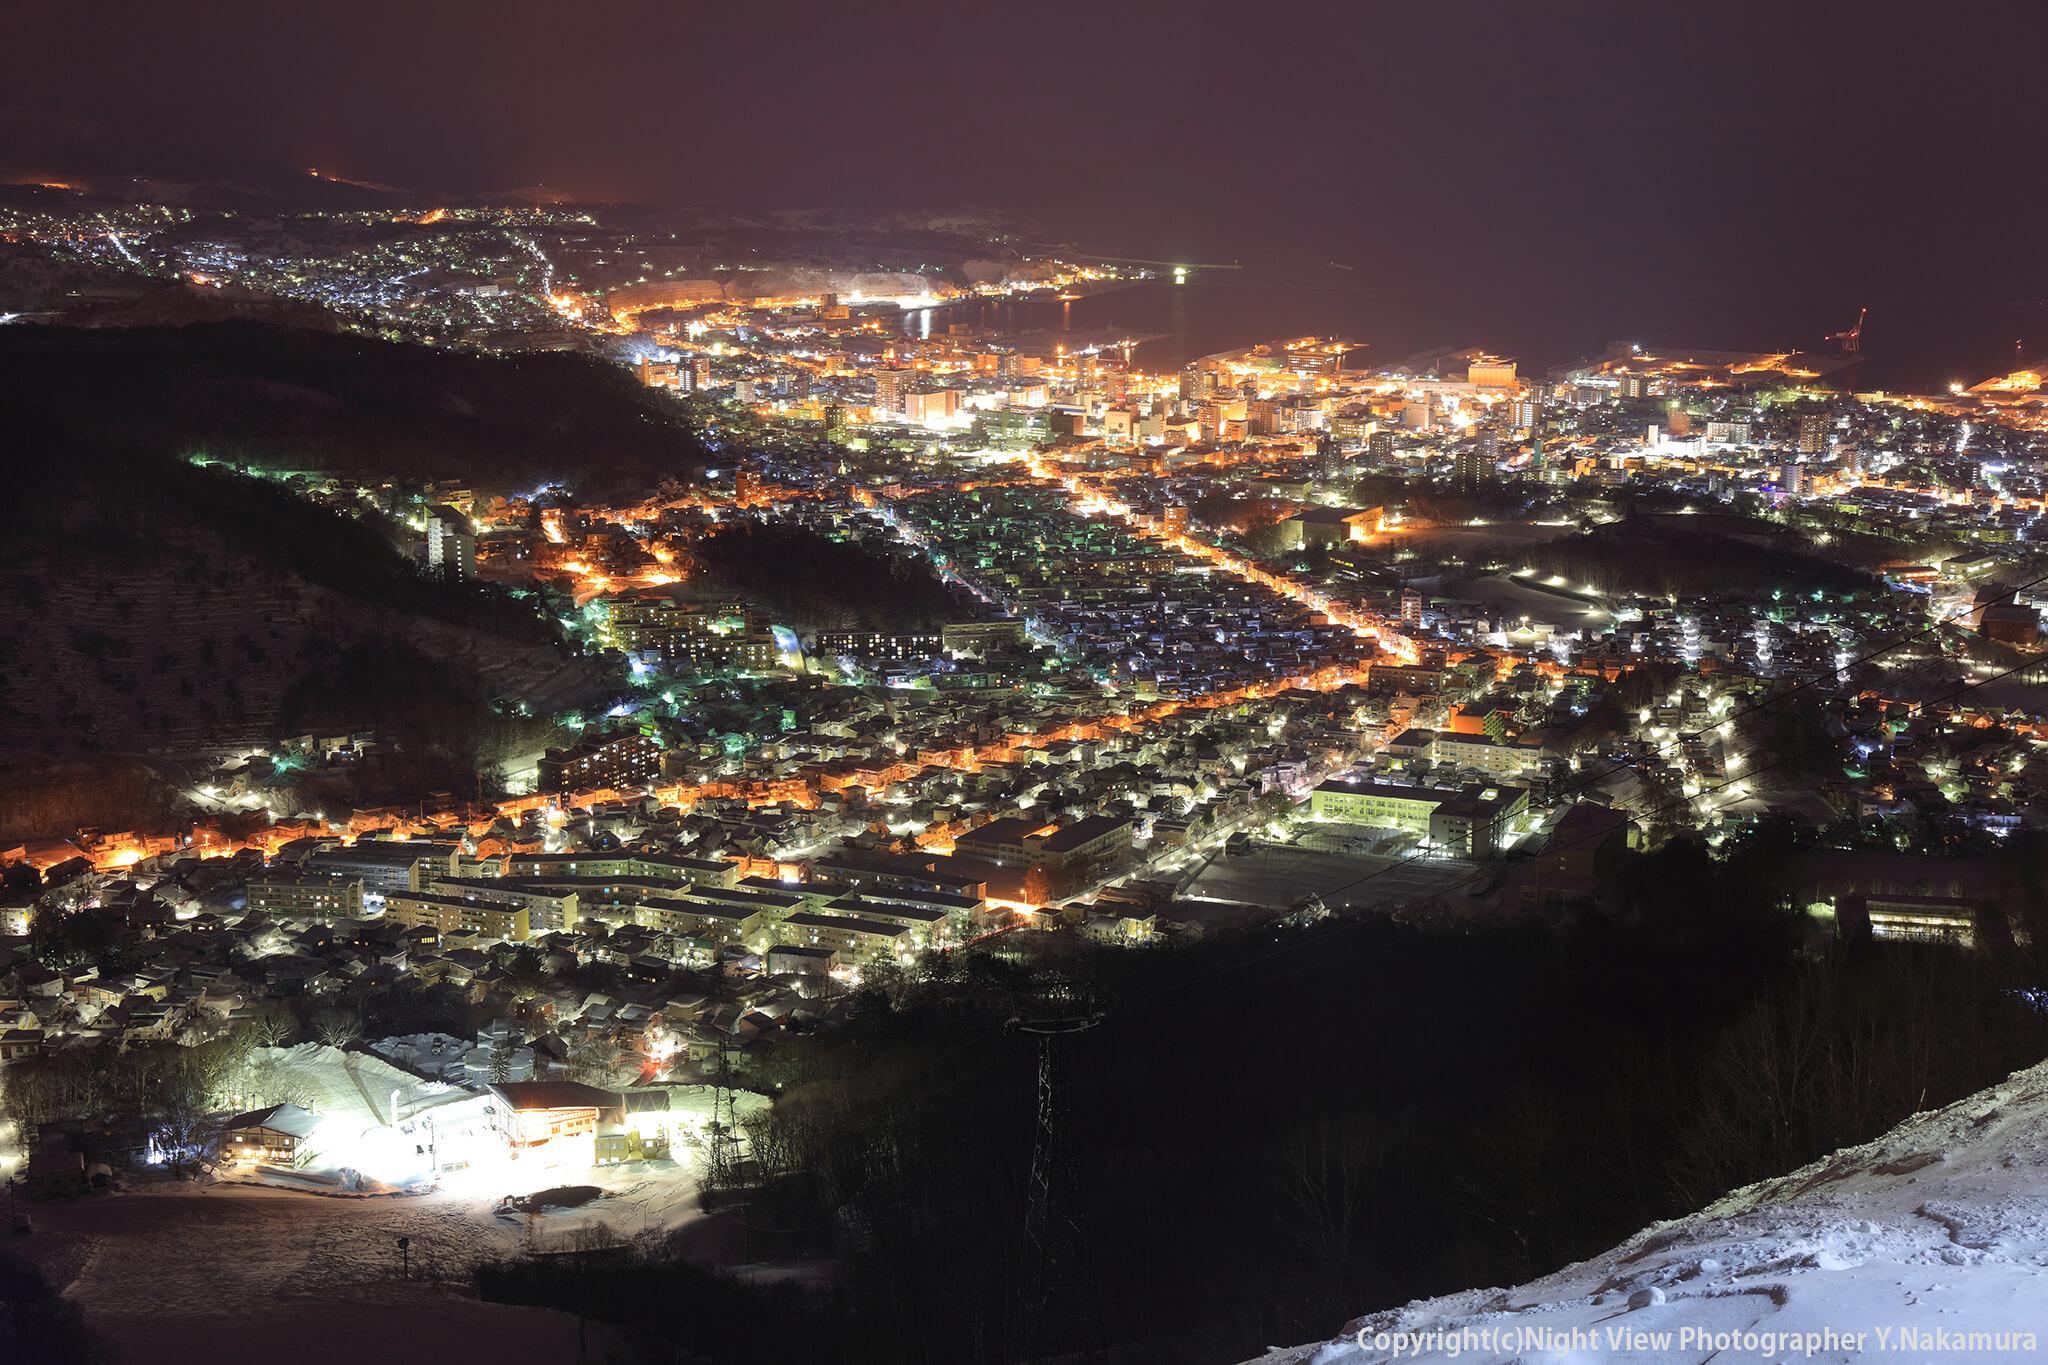 Photo of 小樽の街を一望できる街のシンボル!北海道三大夜景「天狗山」